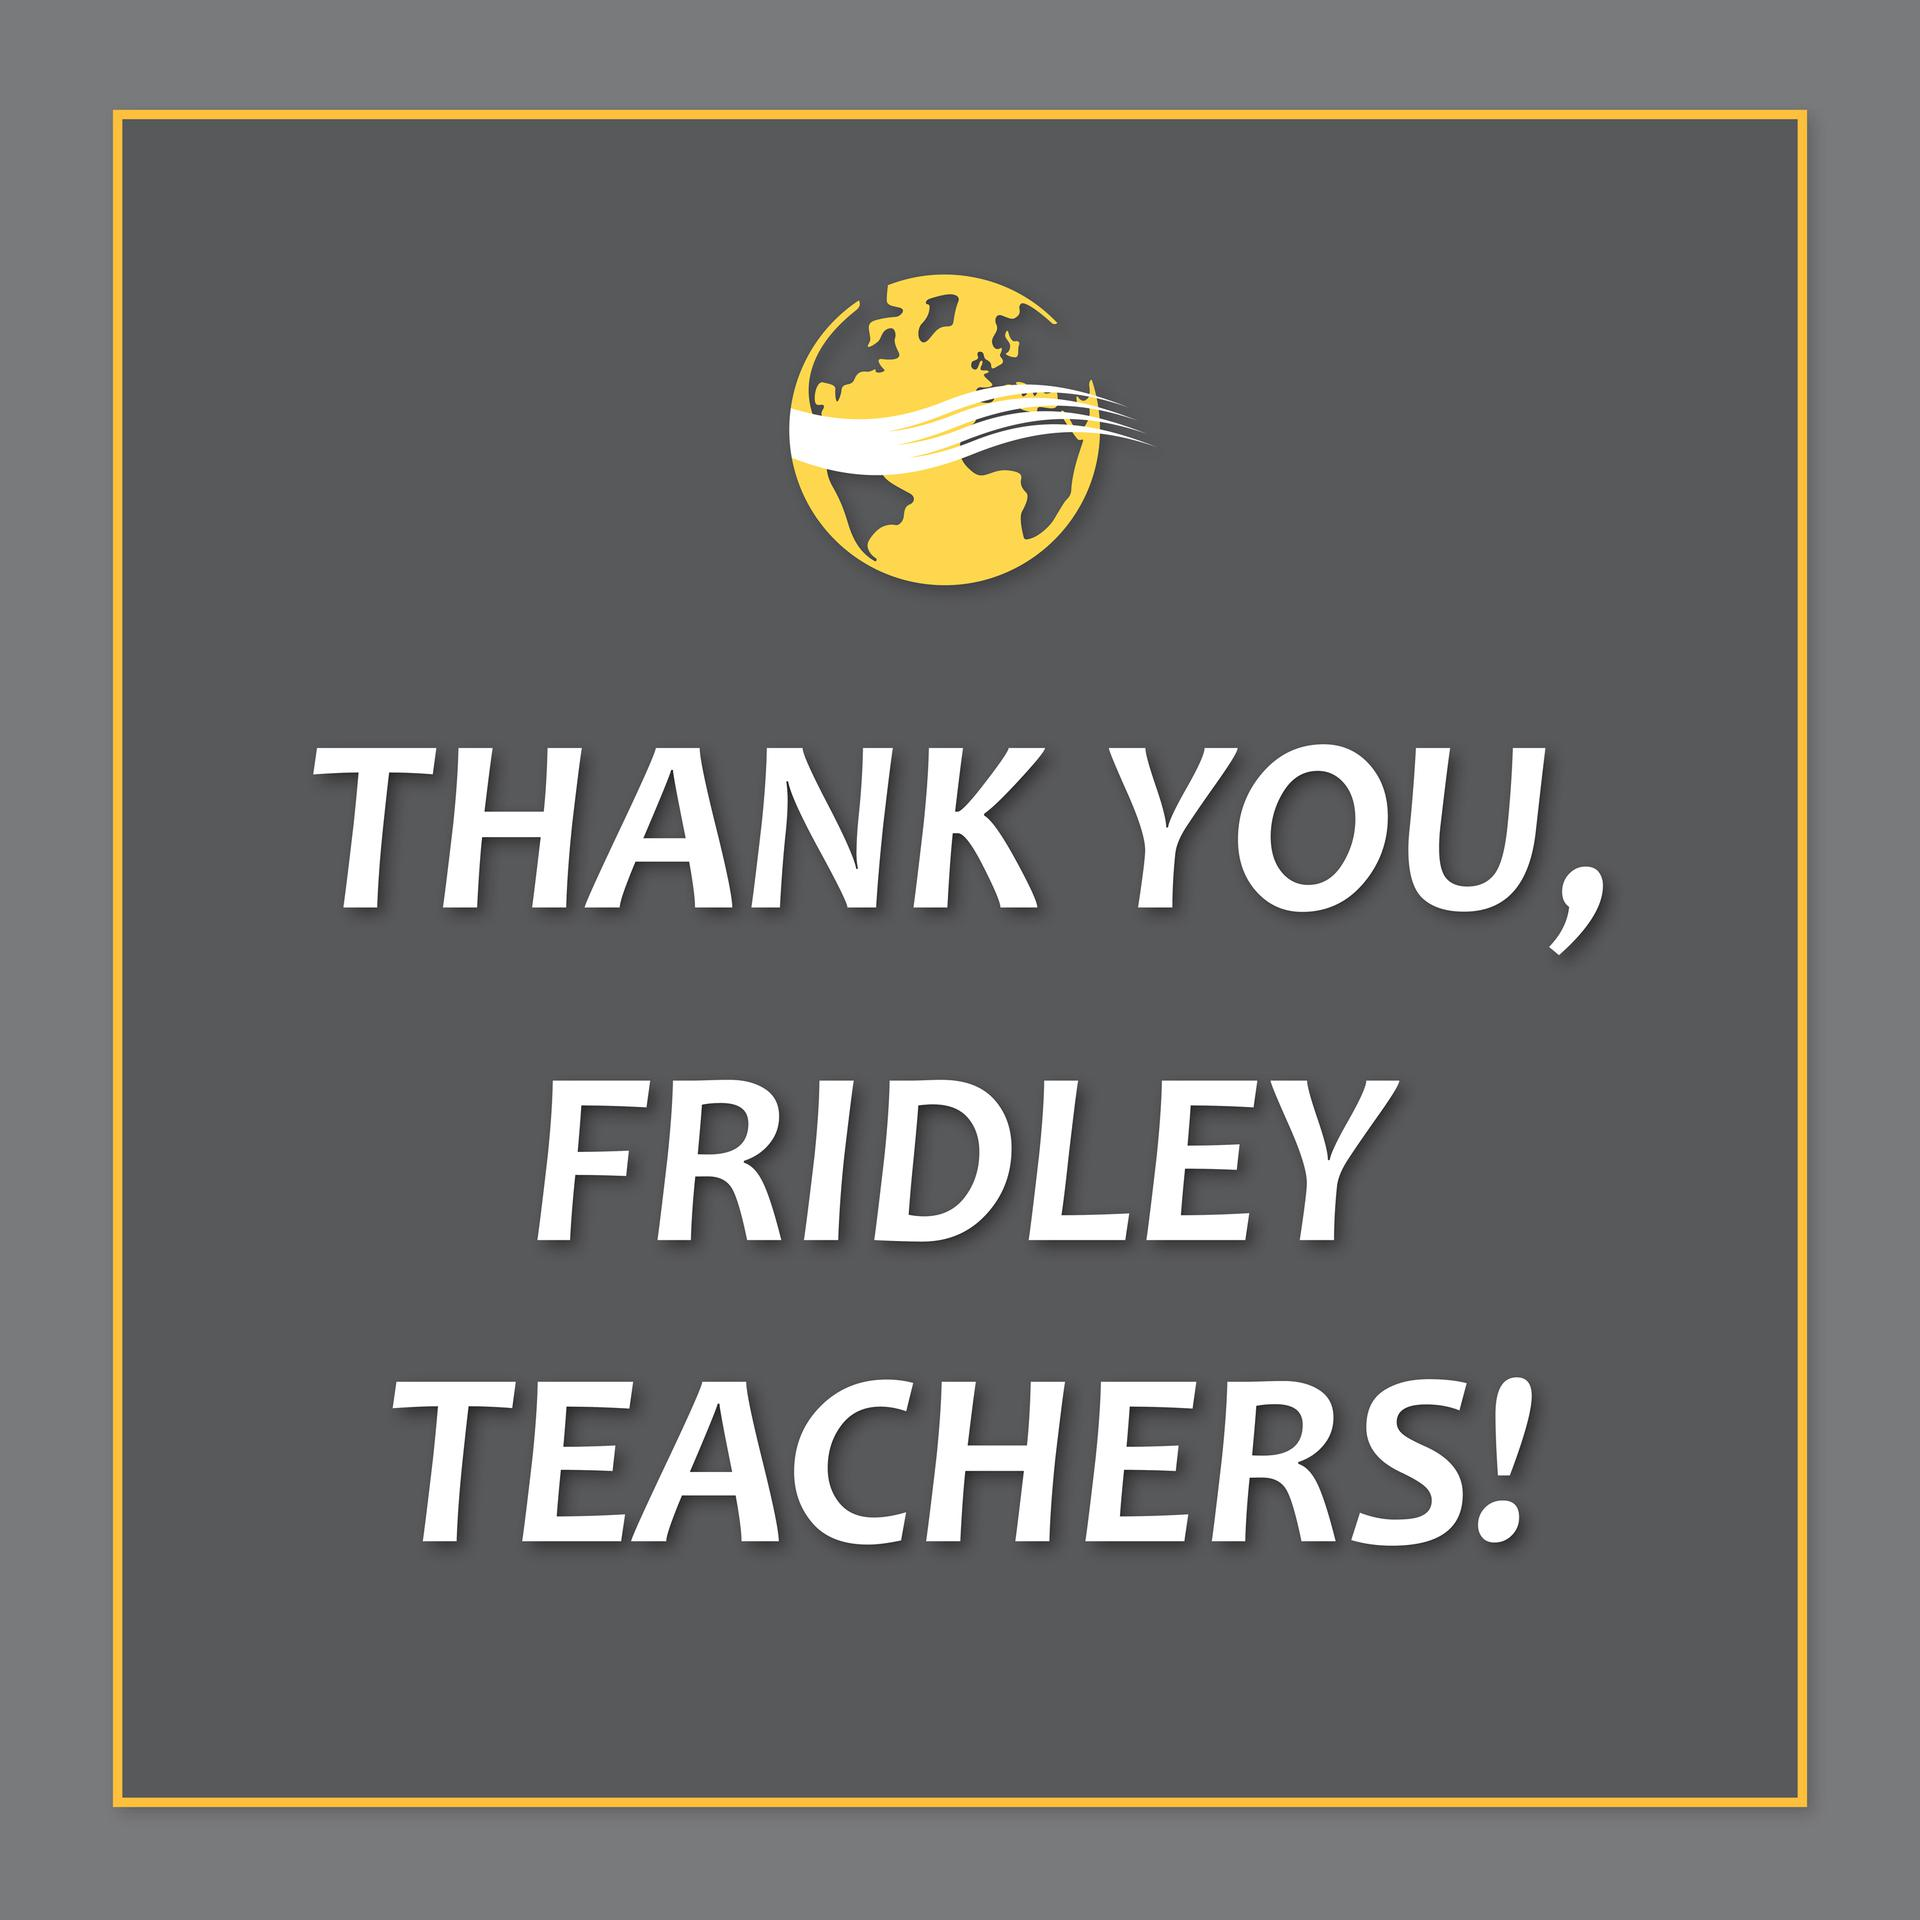 Thank you, Fridley Teachers!